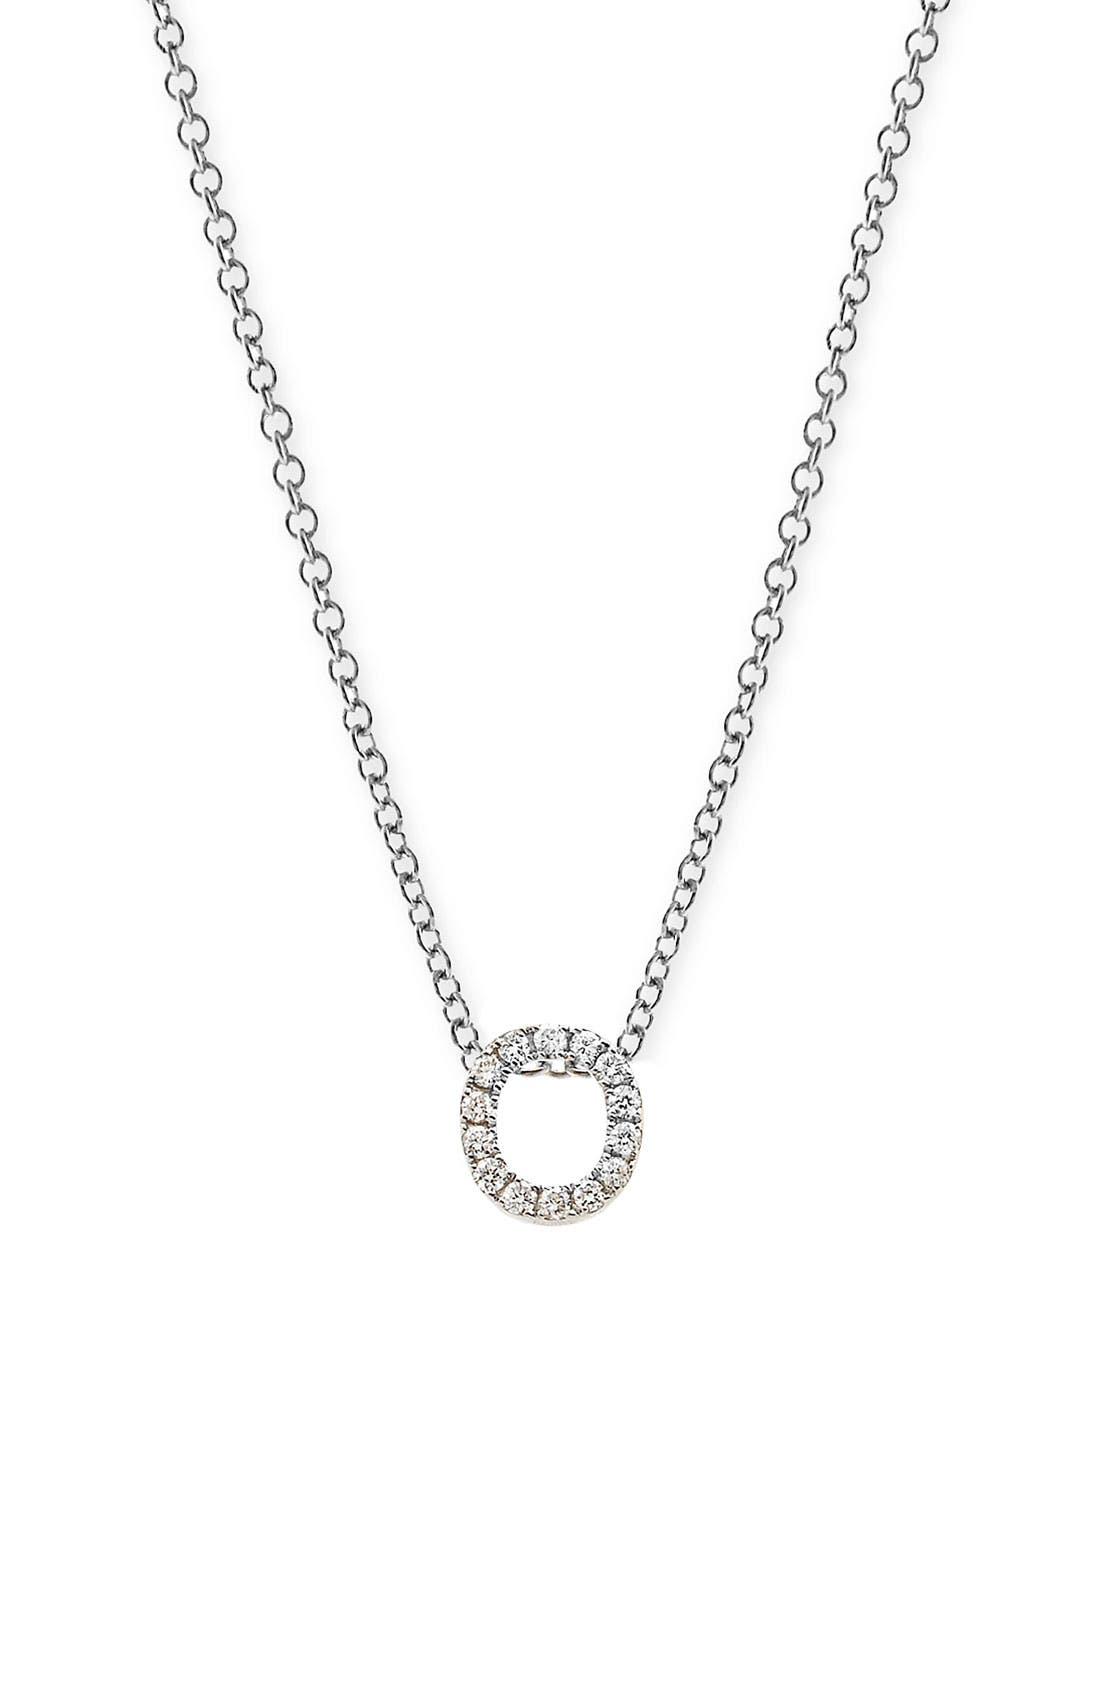 315c5a205 Women's Initial, Monogram & Jewelry | Nordstrom